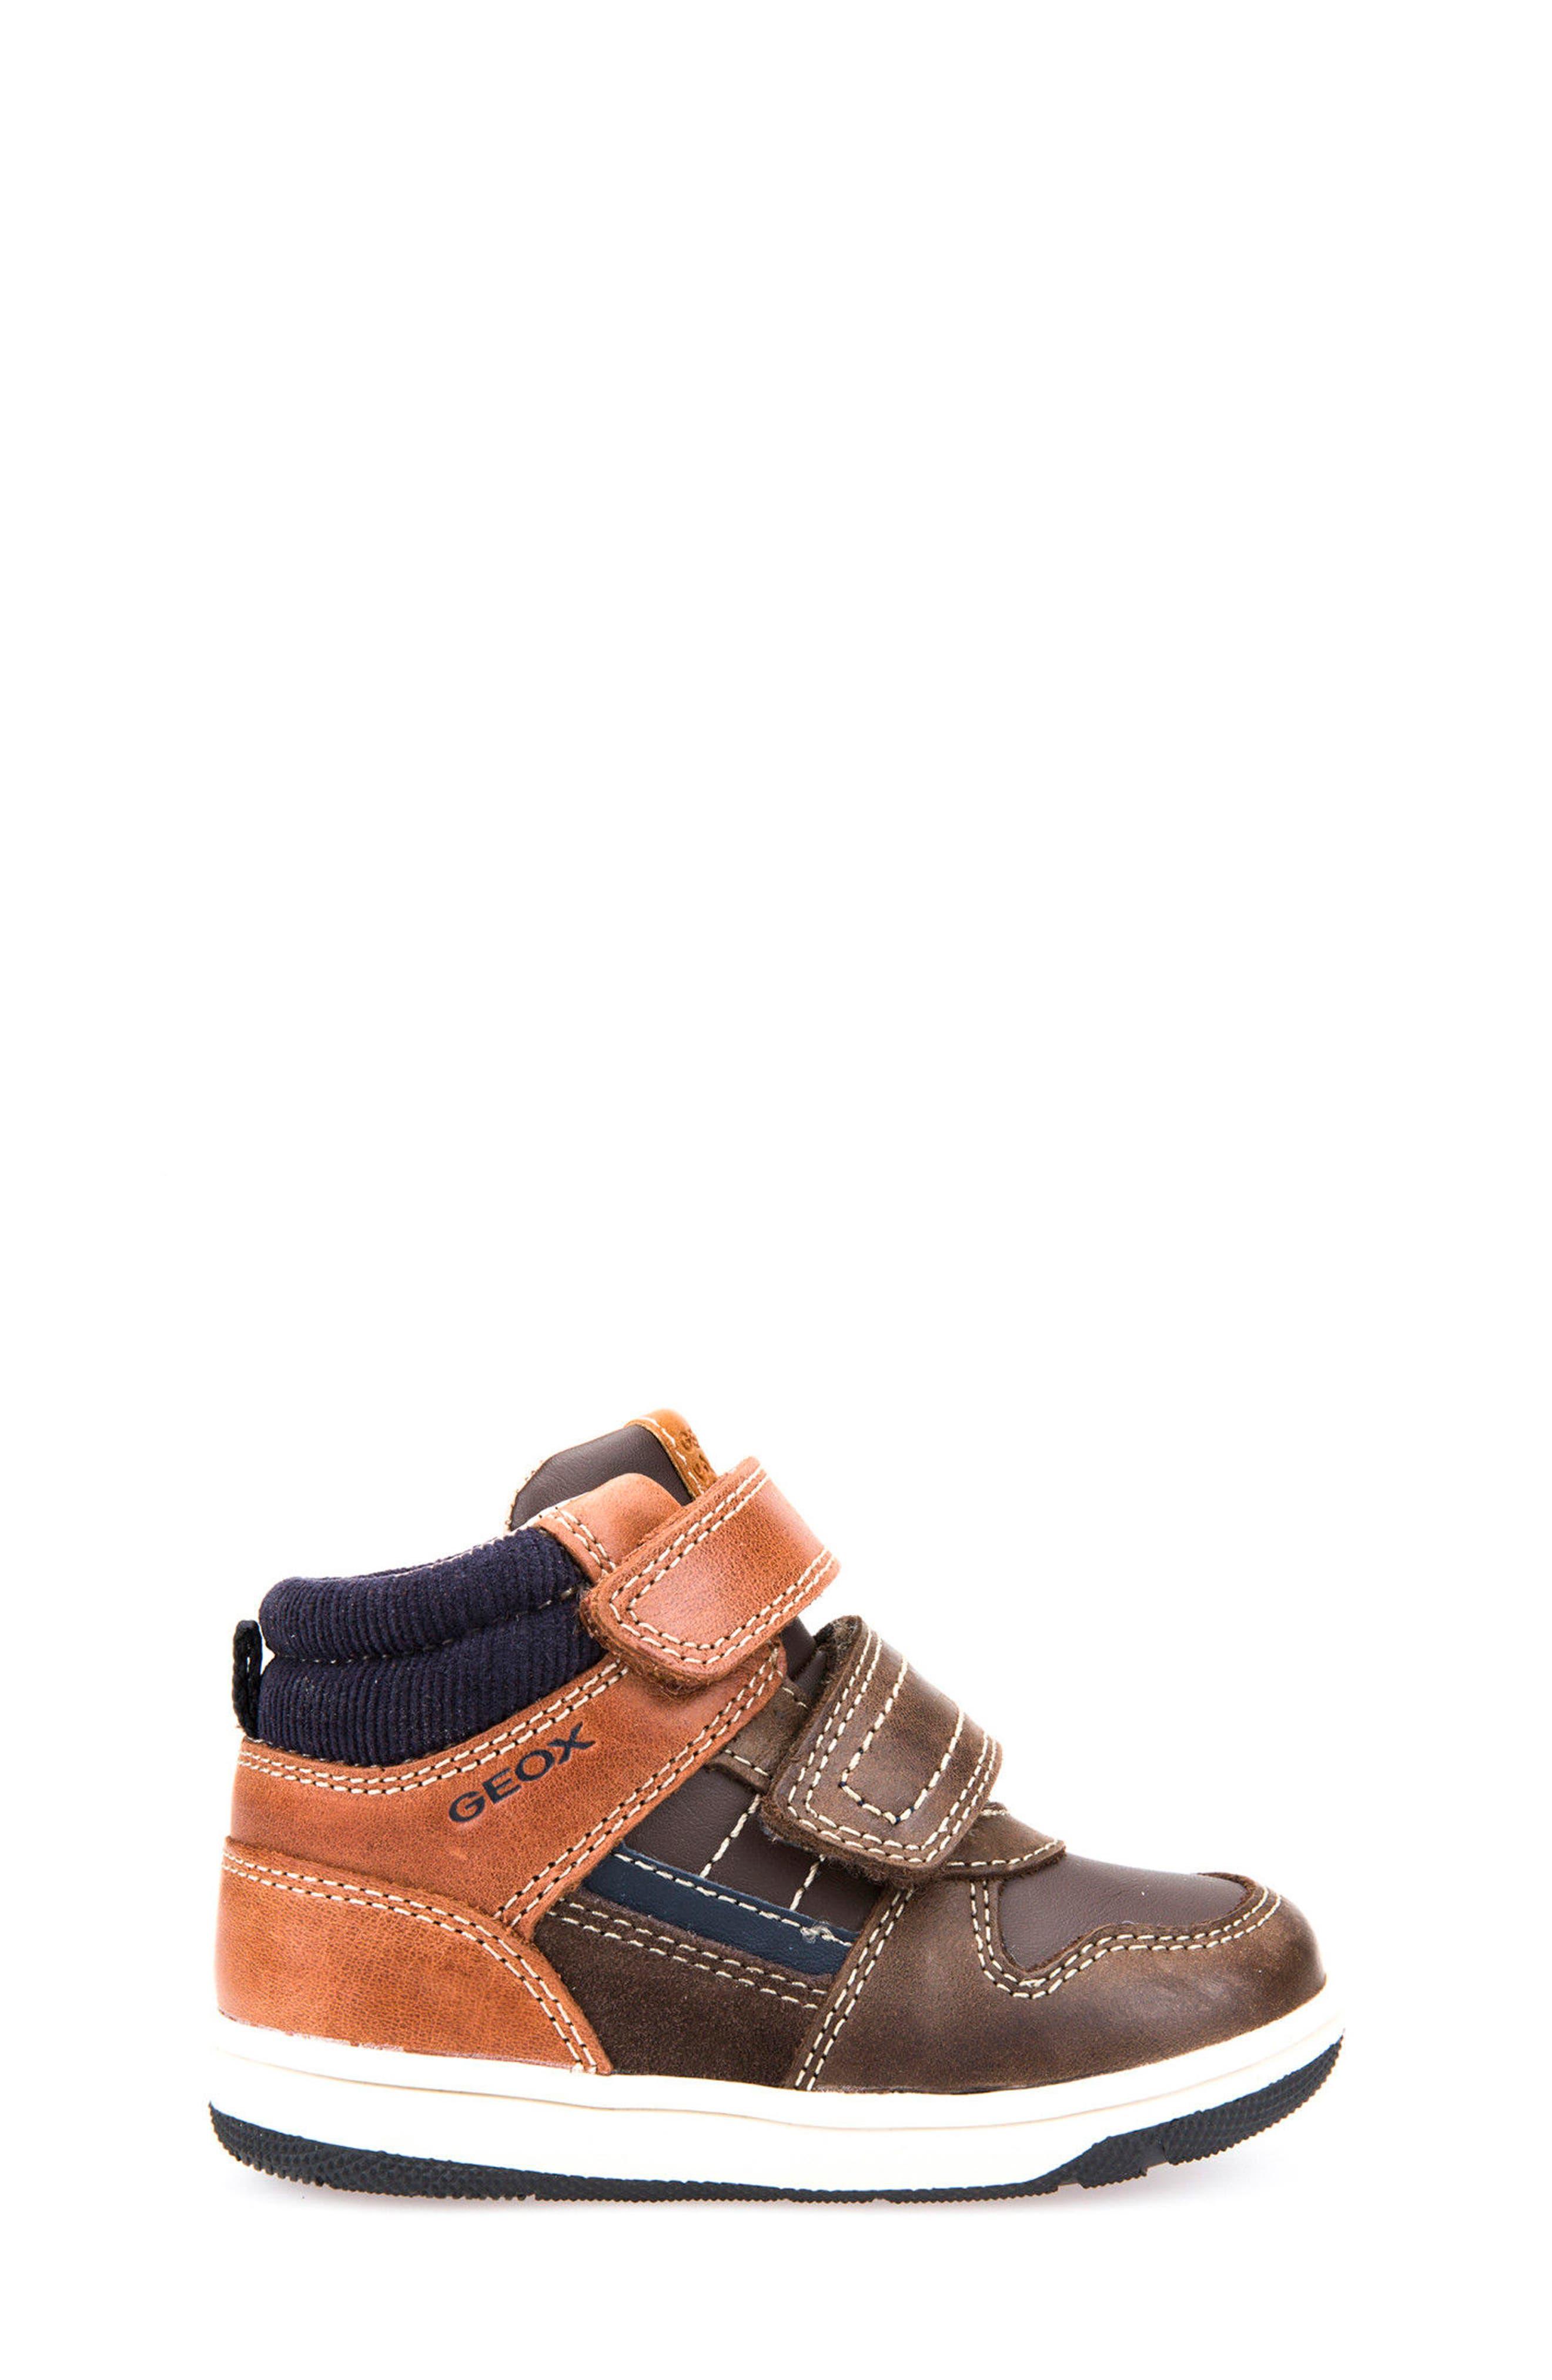 Alternate Image 3  - Geox New Flick Mid Top Sneaker (Walker & Toddler)